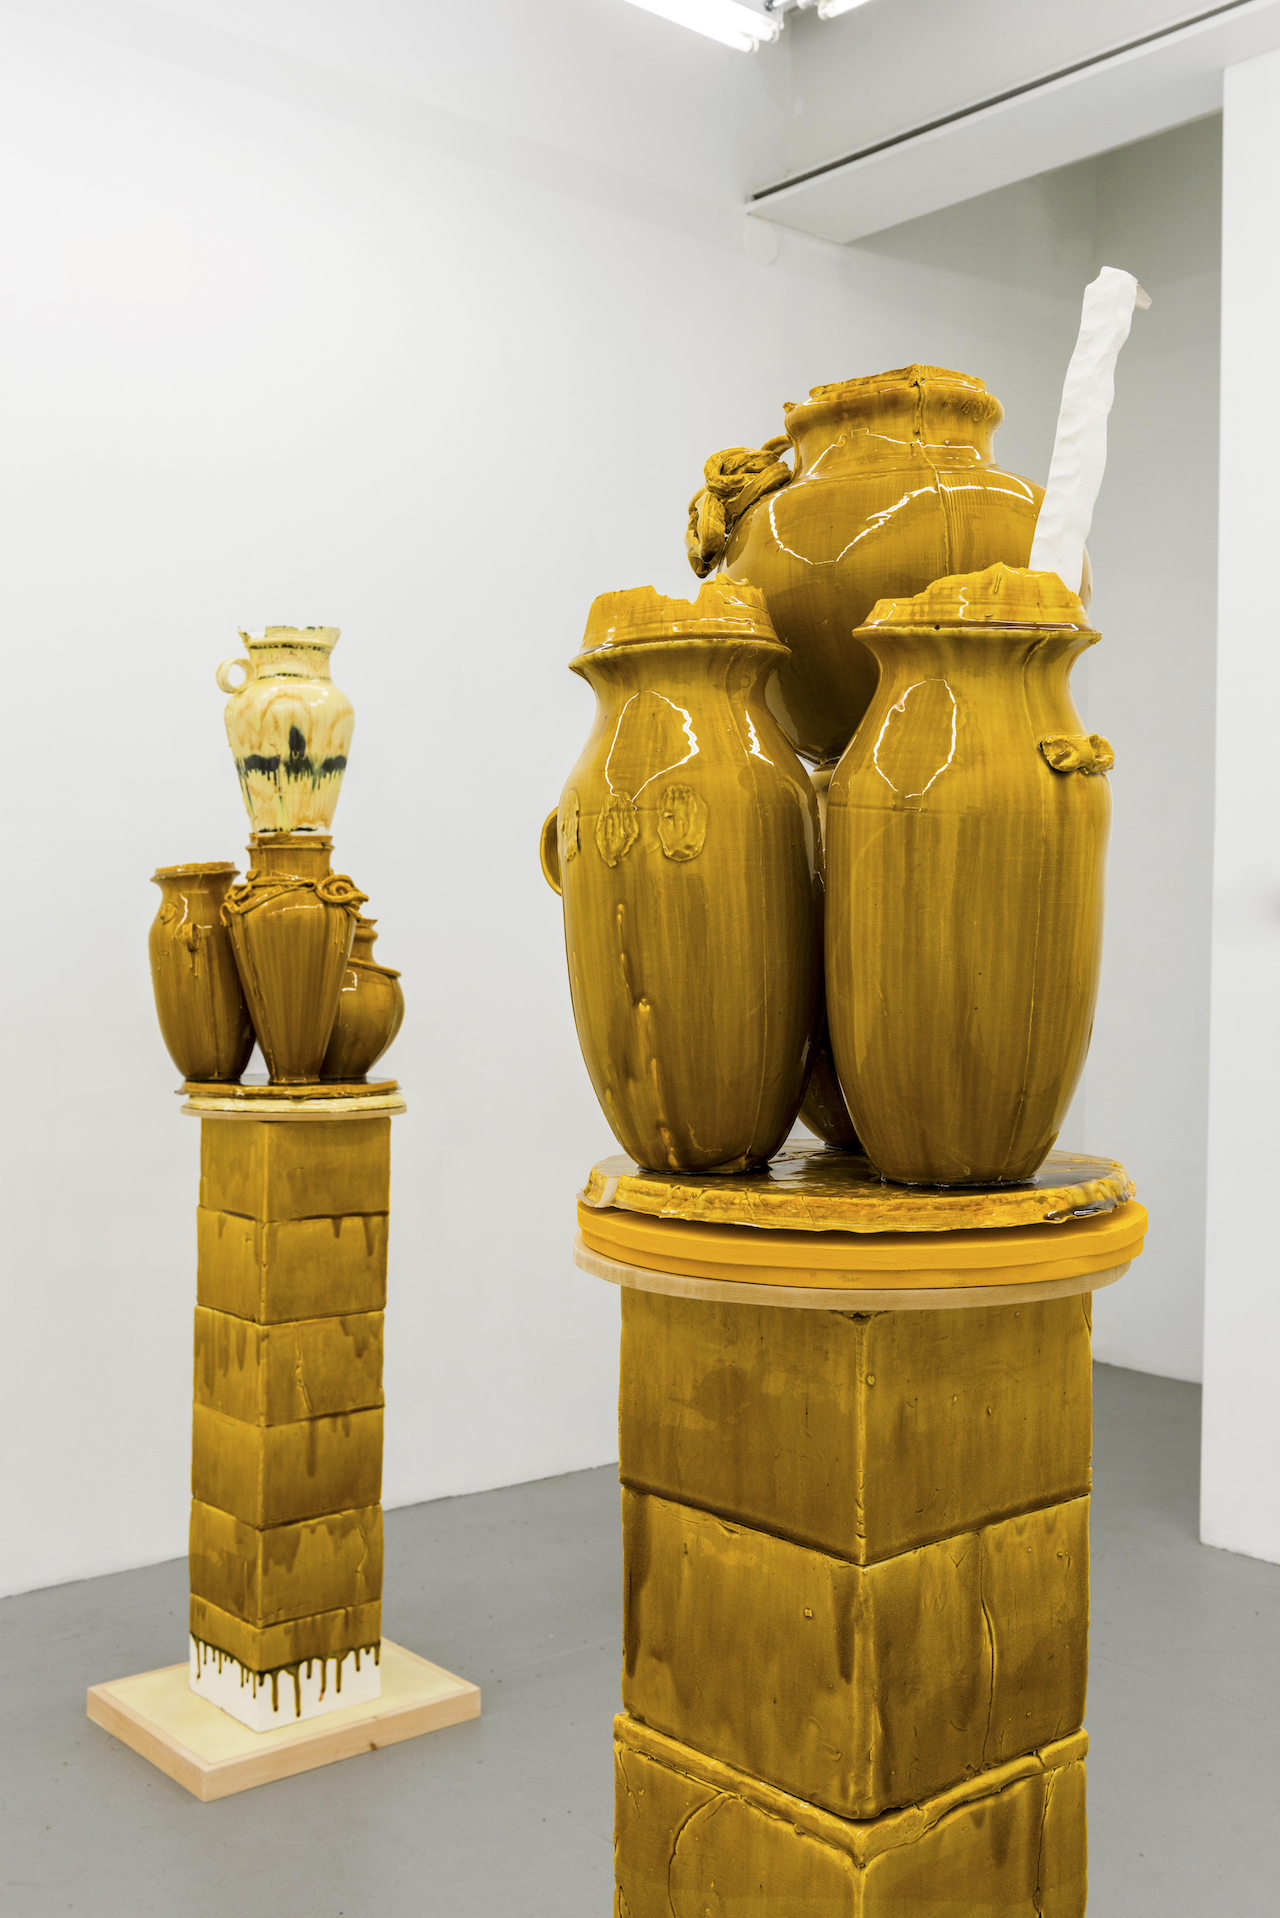 "Foreground: Nicole Cherubini ""Goldenrod"" (2015), earthenware, glaze, medium-density fiberboard (MDF), magic sculpt, 67 x 19 x 22 inches; background: Nicole Cherubini ""Althean"" (2015), earthenware, glaze, medium-density fiberboard (MDF), magic sculpt, 5 min epoxy, 75 x 19 x 22 inches (all images courtesy Samsøñ)"